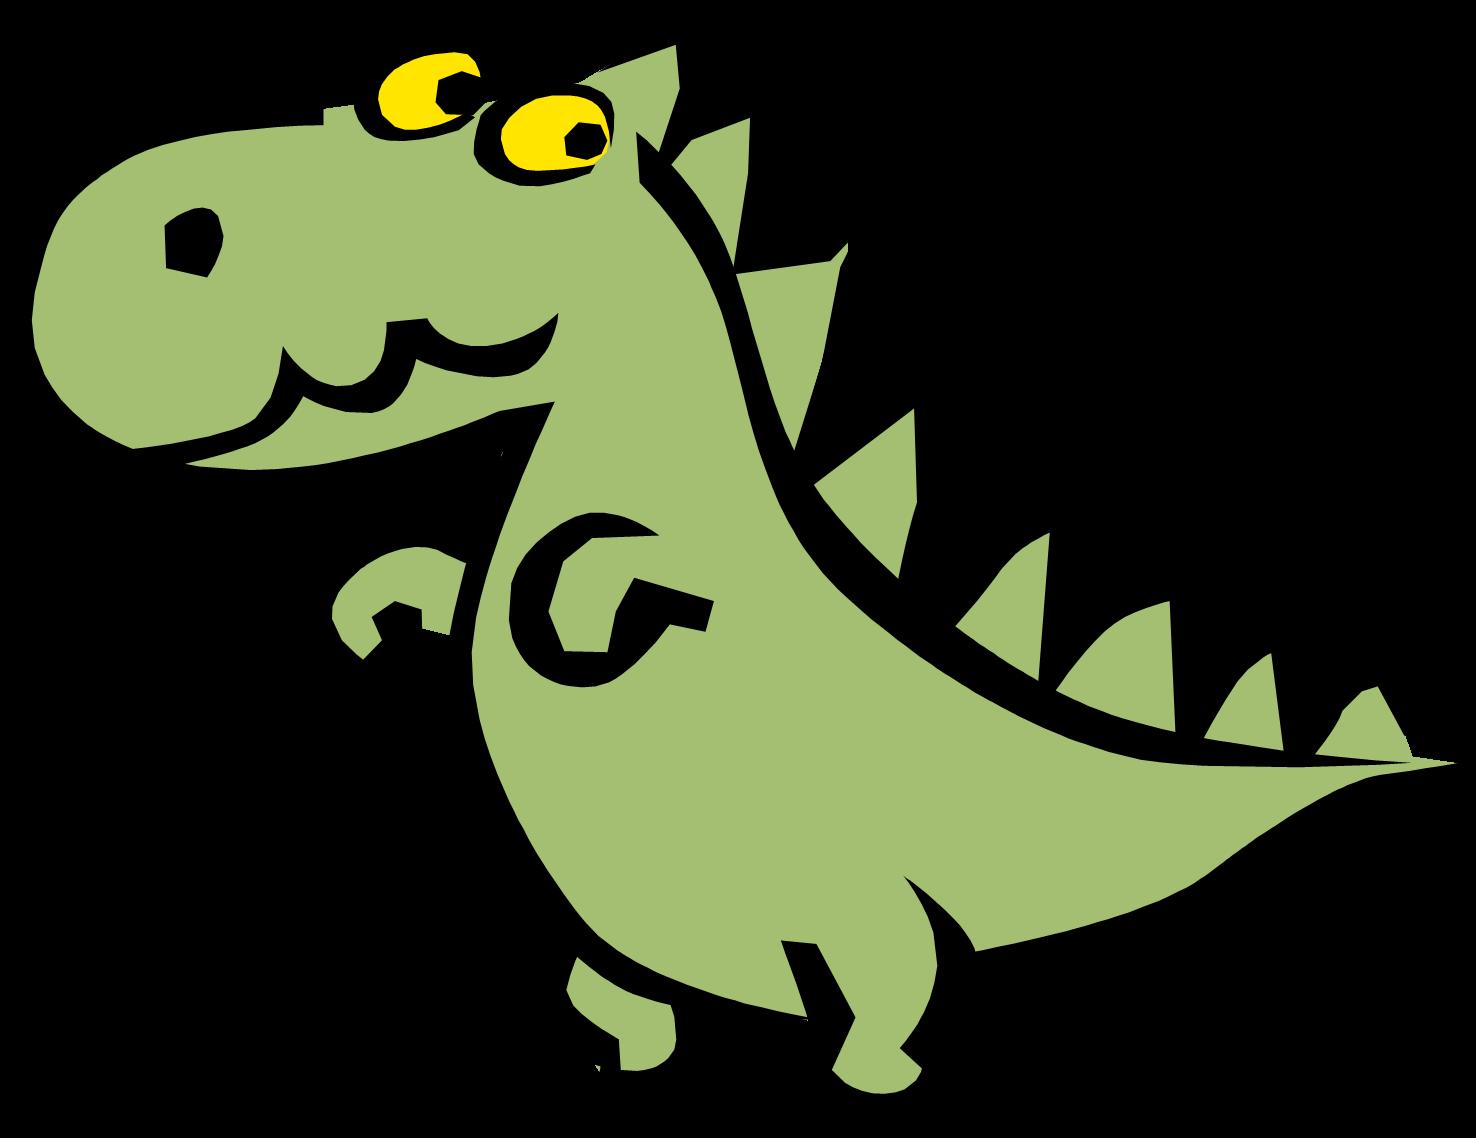 http://3.bp.blogspot.com/-s8T0oWRTAio/UBG2H8t0ysI/AAAAAAAAA4w/mbjXBcCzXbI/s1600/dinosaur.png